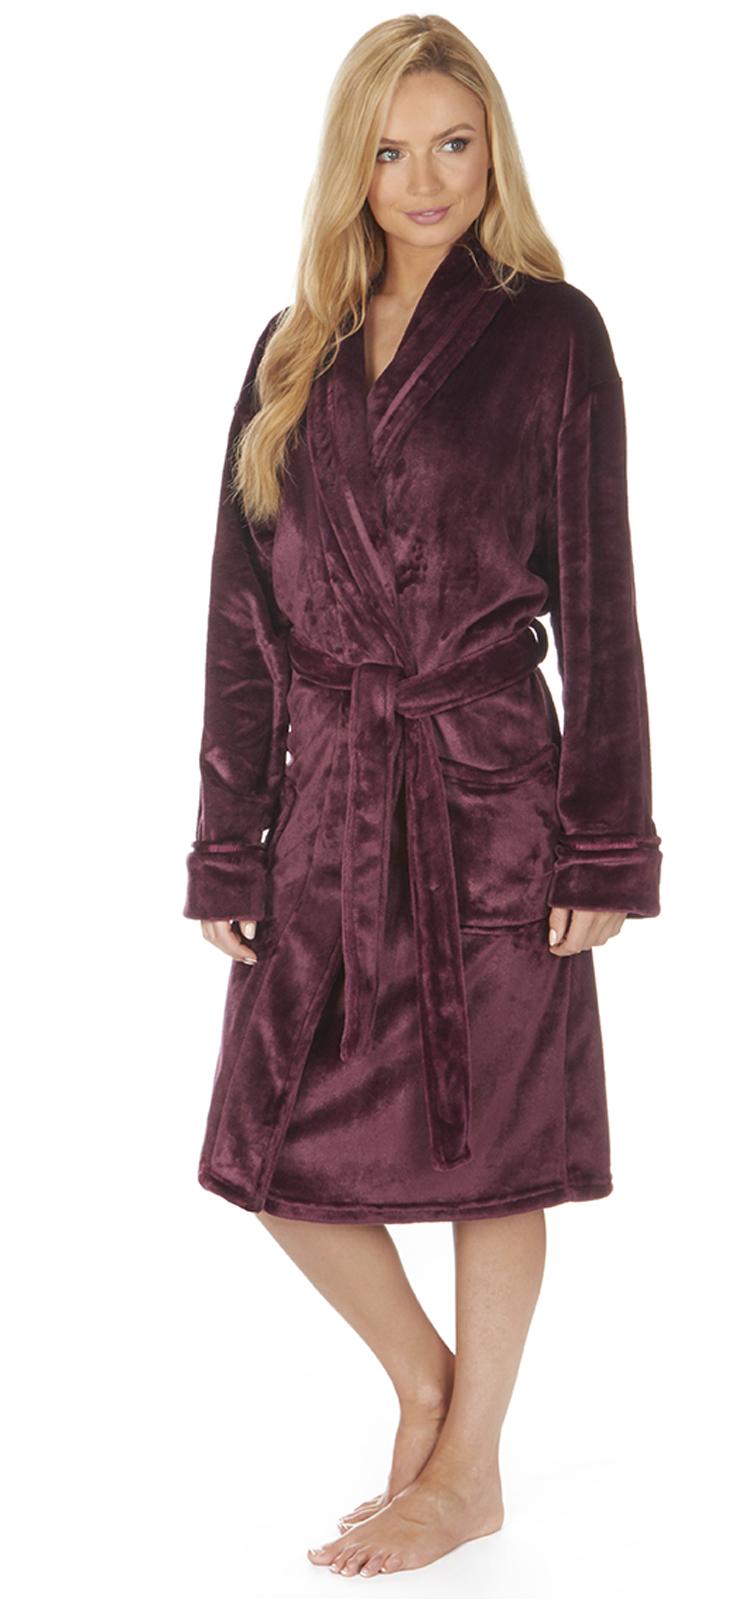 Ladies Bathrobes Plus Size Luxury Womens Plus Size Flannel Fleece Dressing Gown Full